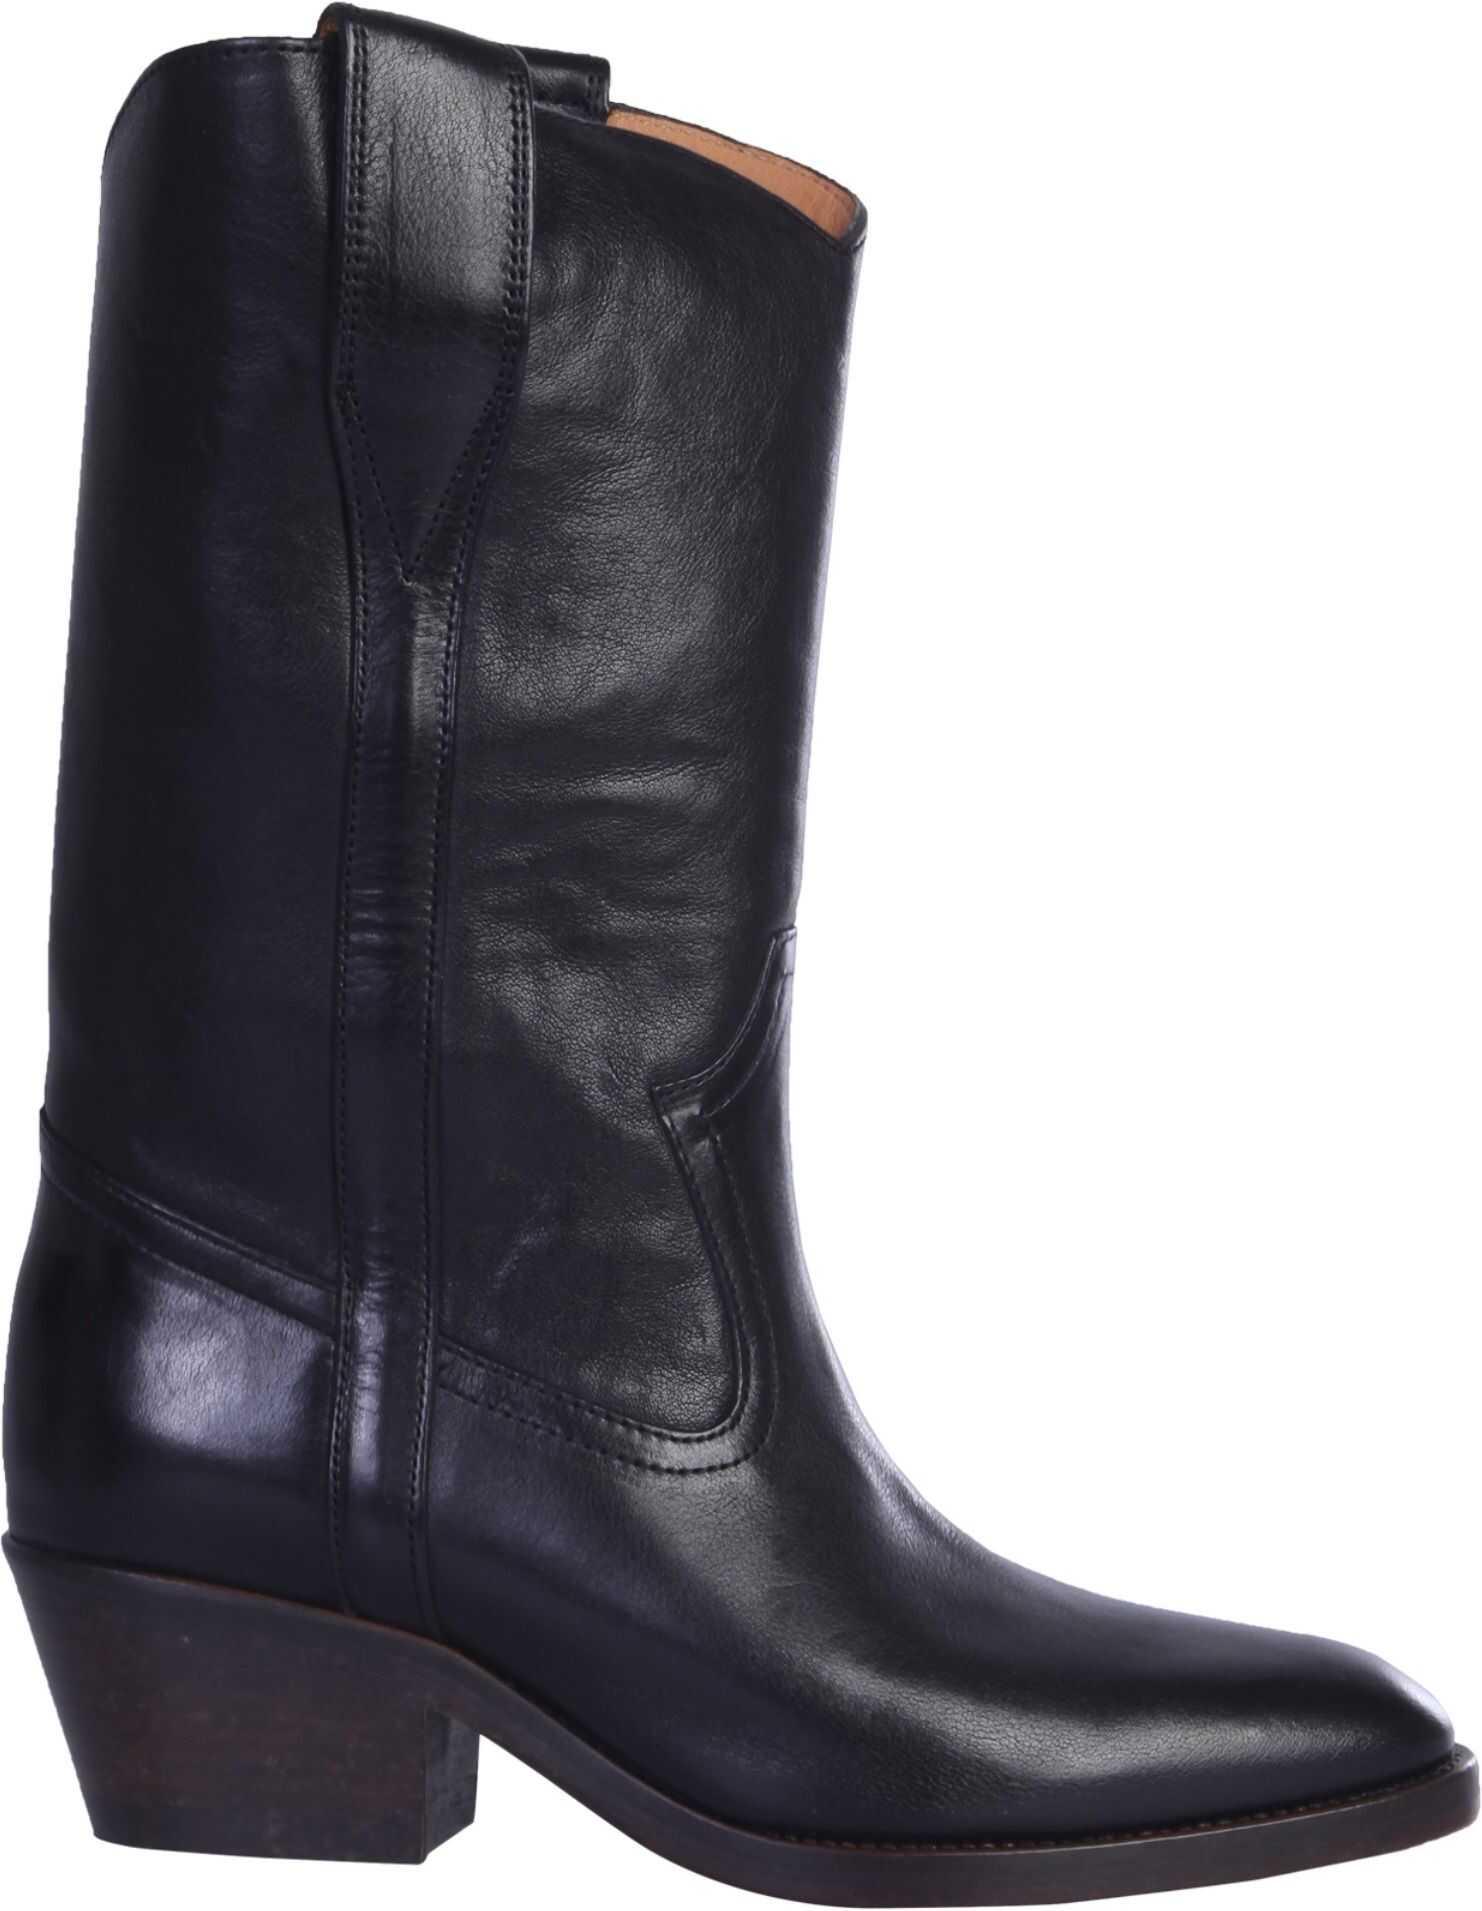 Texan Danta Boots thumbnail